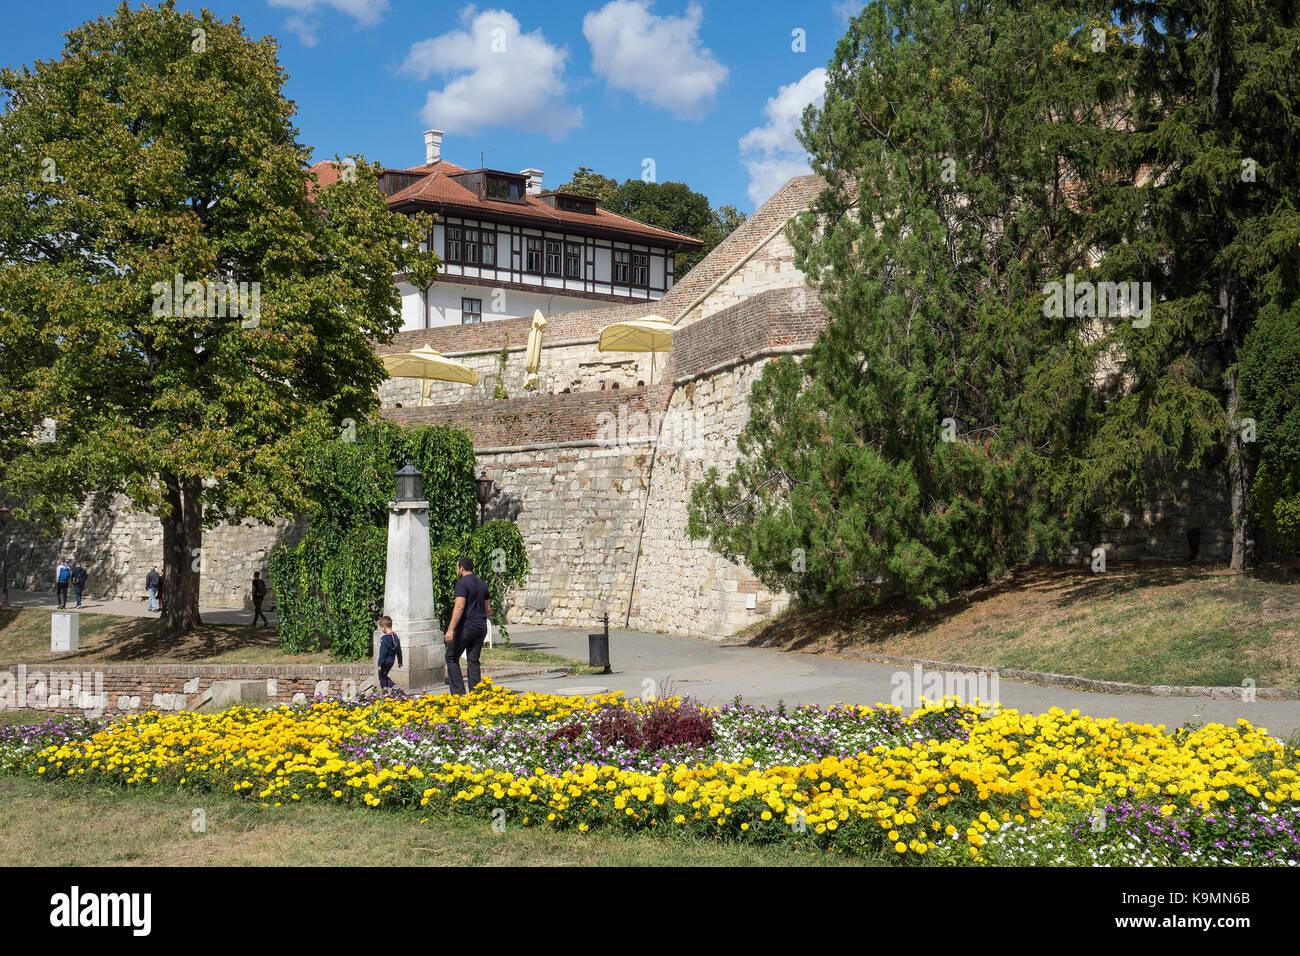 Serbia, Belgrade, Kalemegdan Fortress - Stock Image